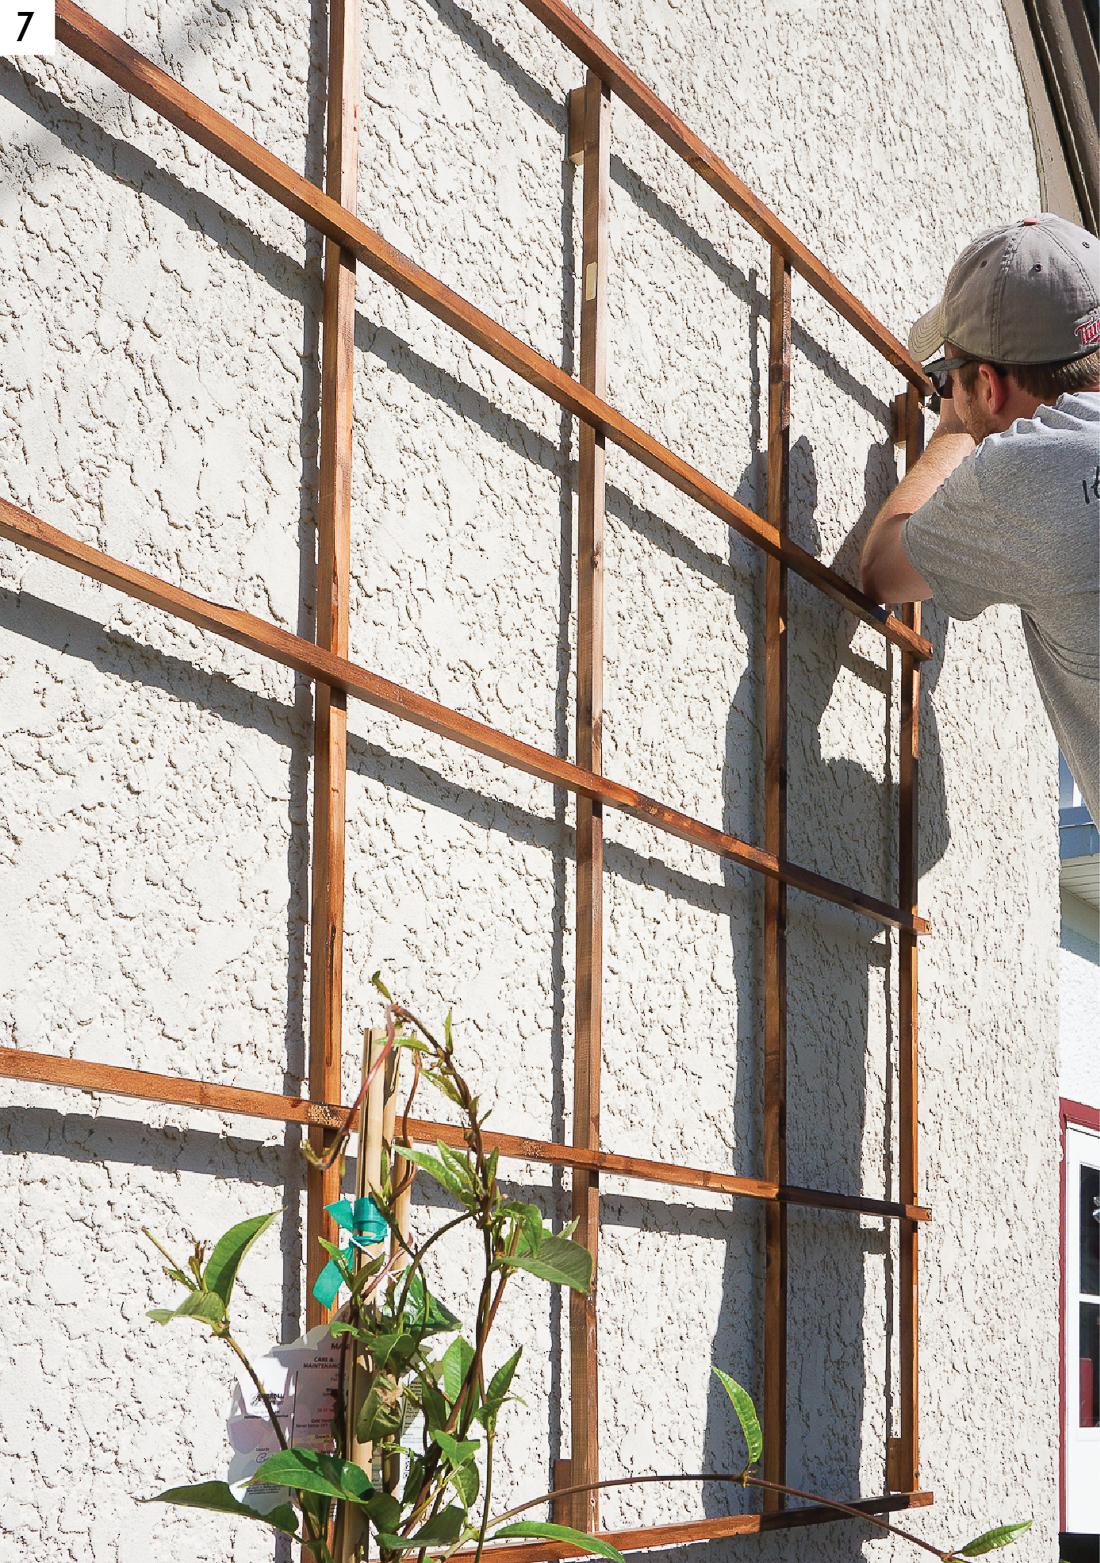 Build a Modern Grid Trellis from Garden Stakes - Francois et Moi